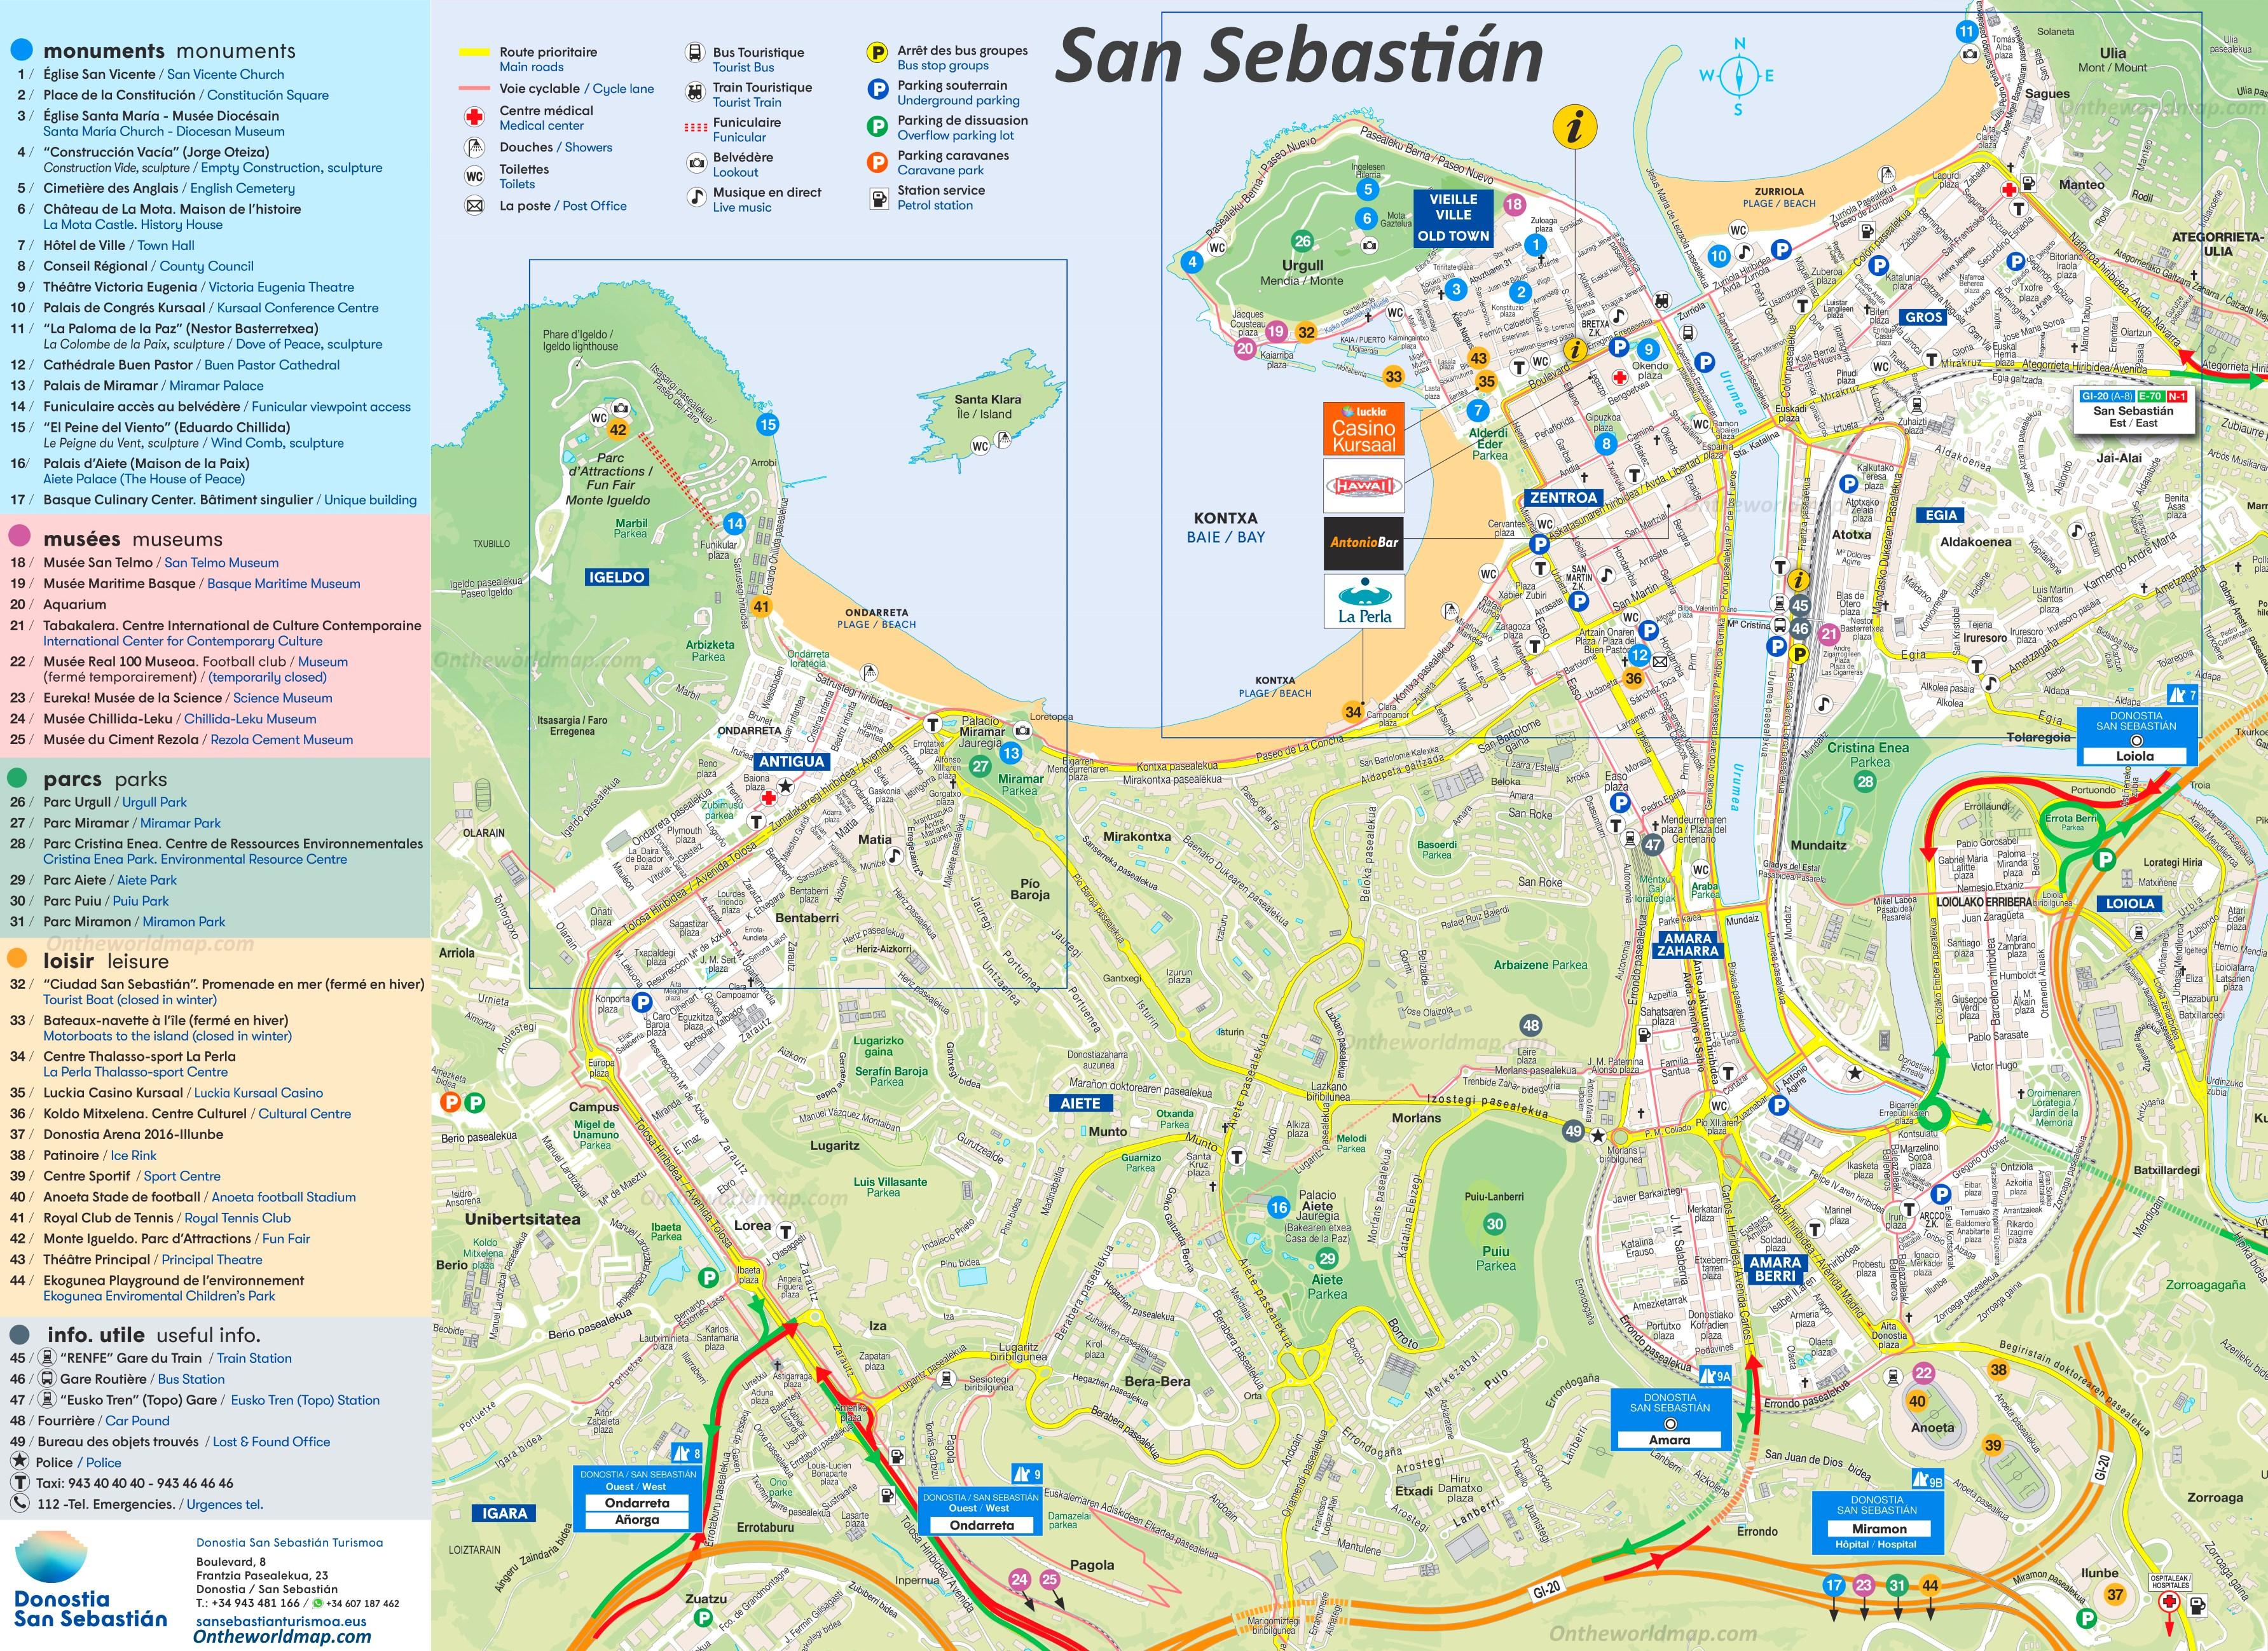 Map Of Spain San Sebastian.San Sebastian Map Spain Maps Of San Sebastian Donostia